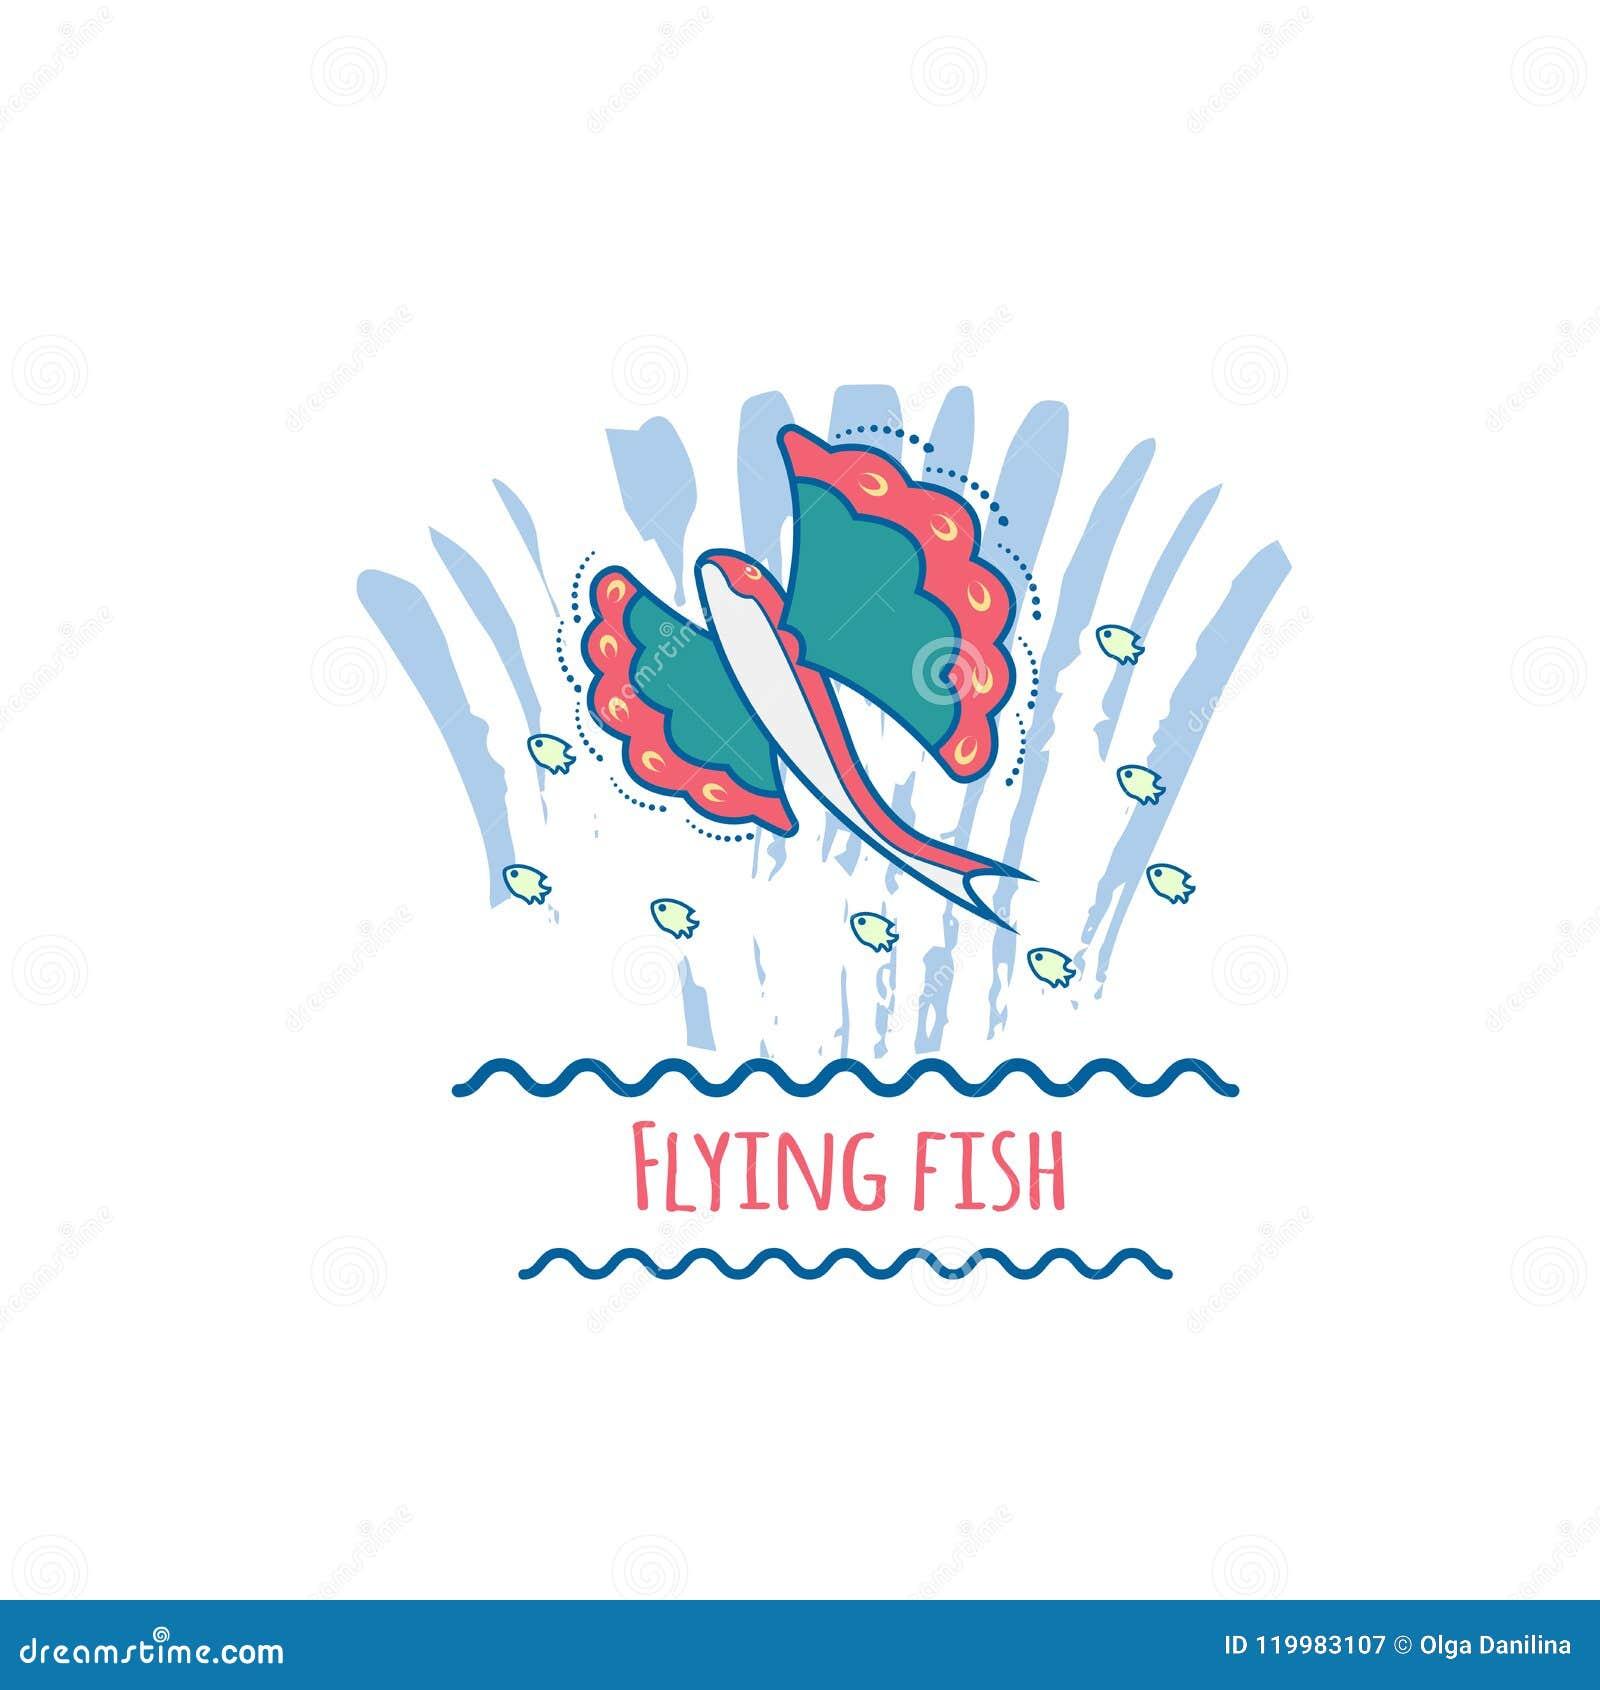 Flying Fish Vector Stock Vector Illustration Of Beautiful 119983107